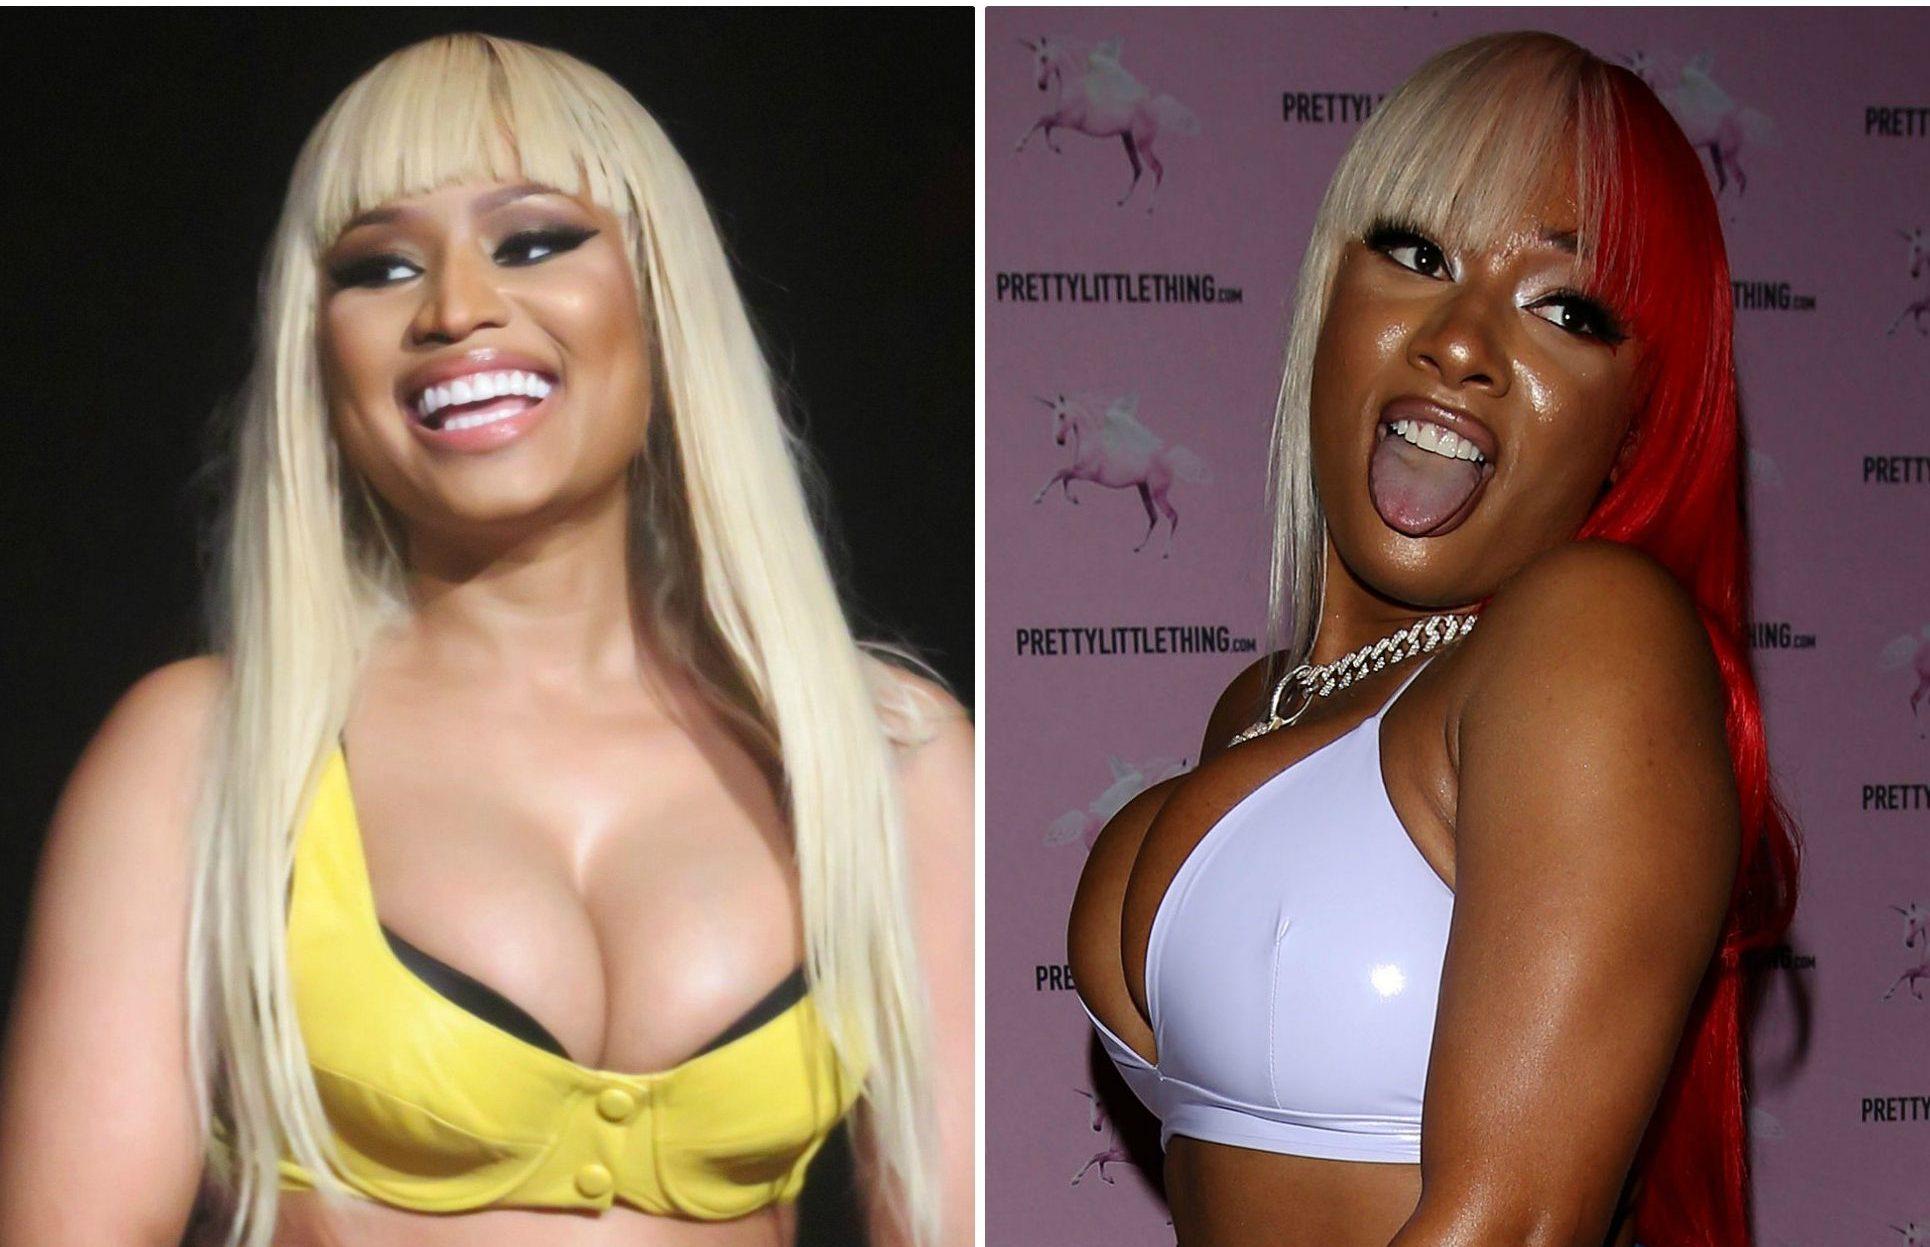 Megan Thee Stallion and Nicki Minaj side-by-side